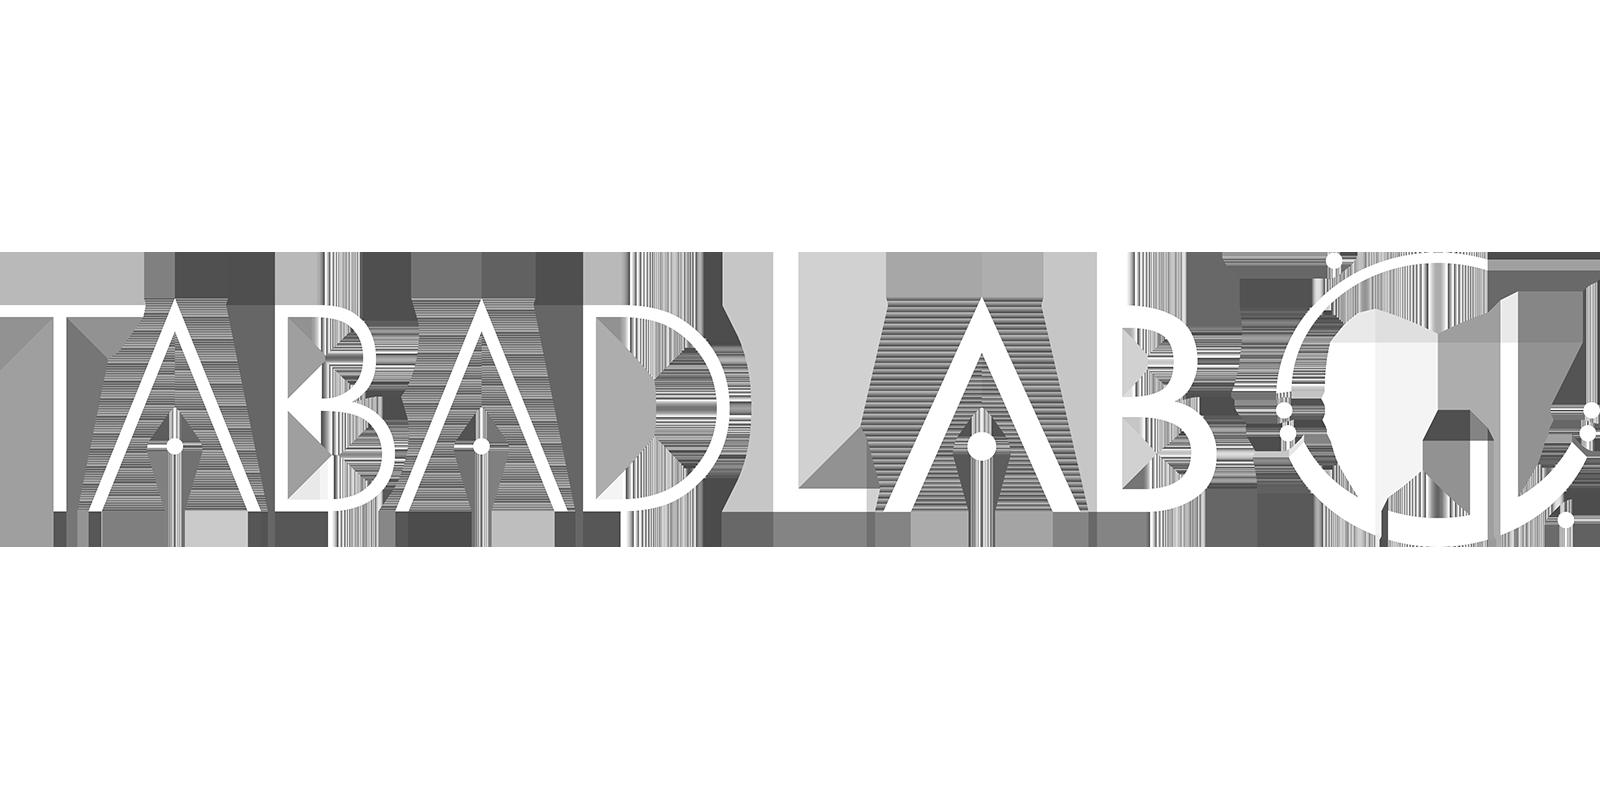 Tabadlab | Understanding Change